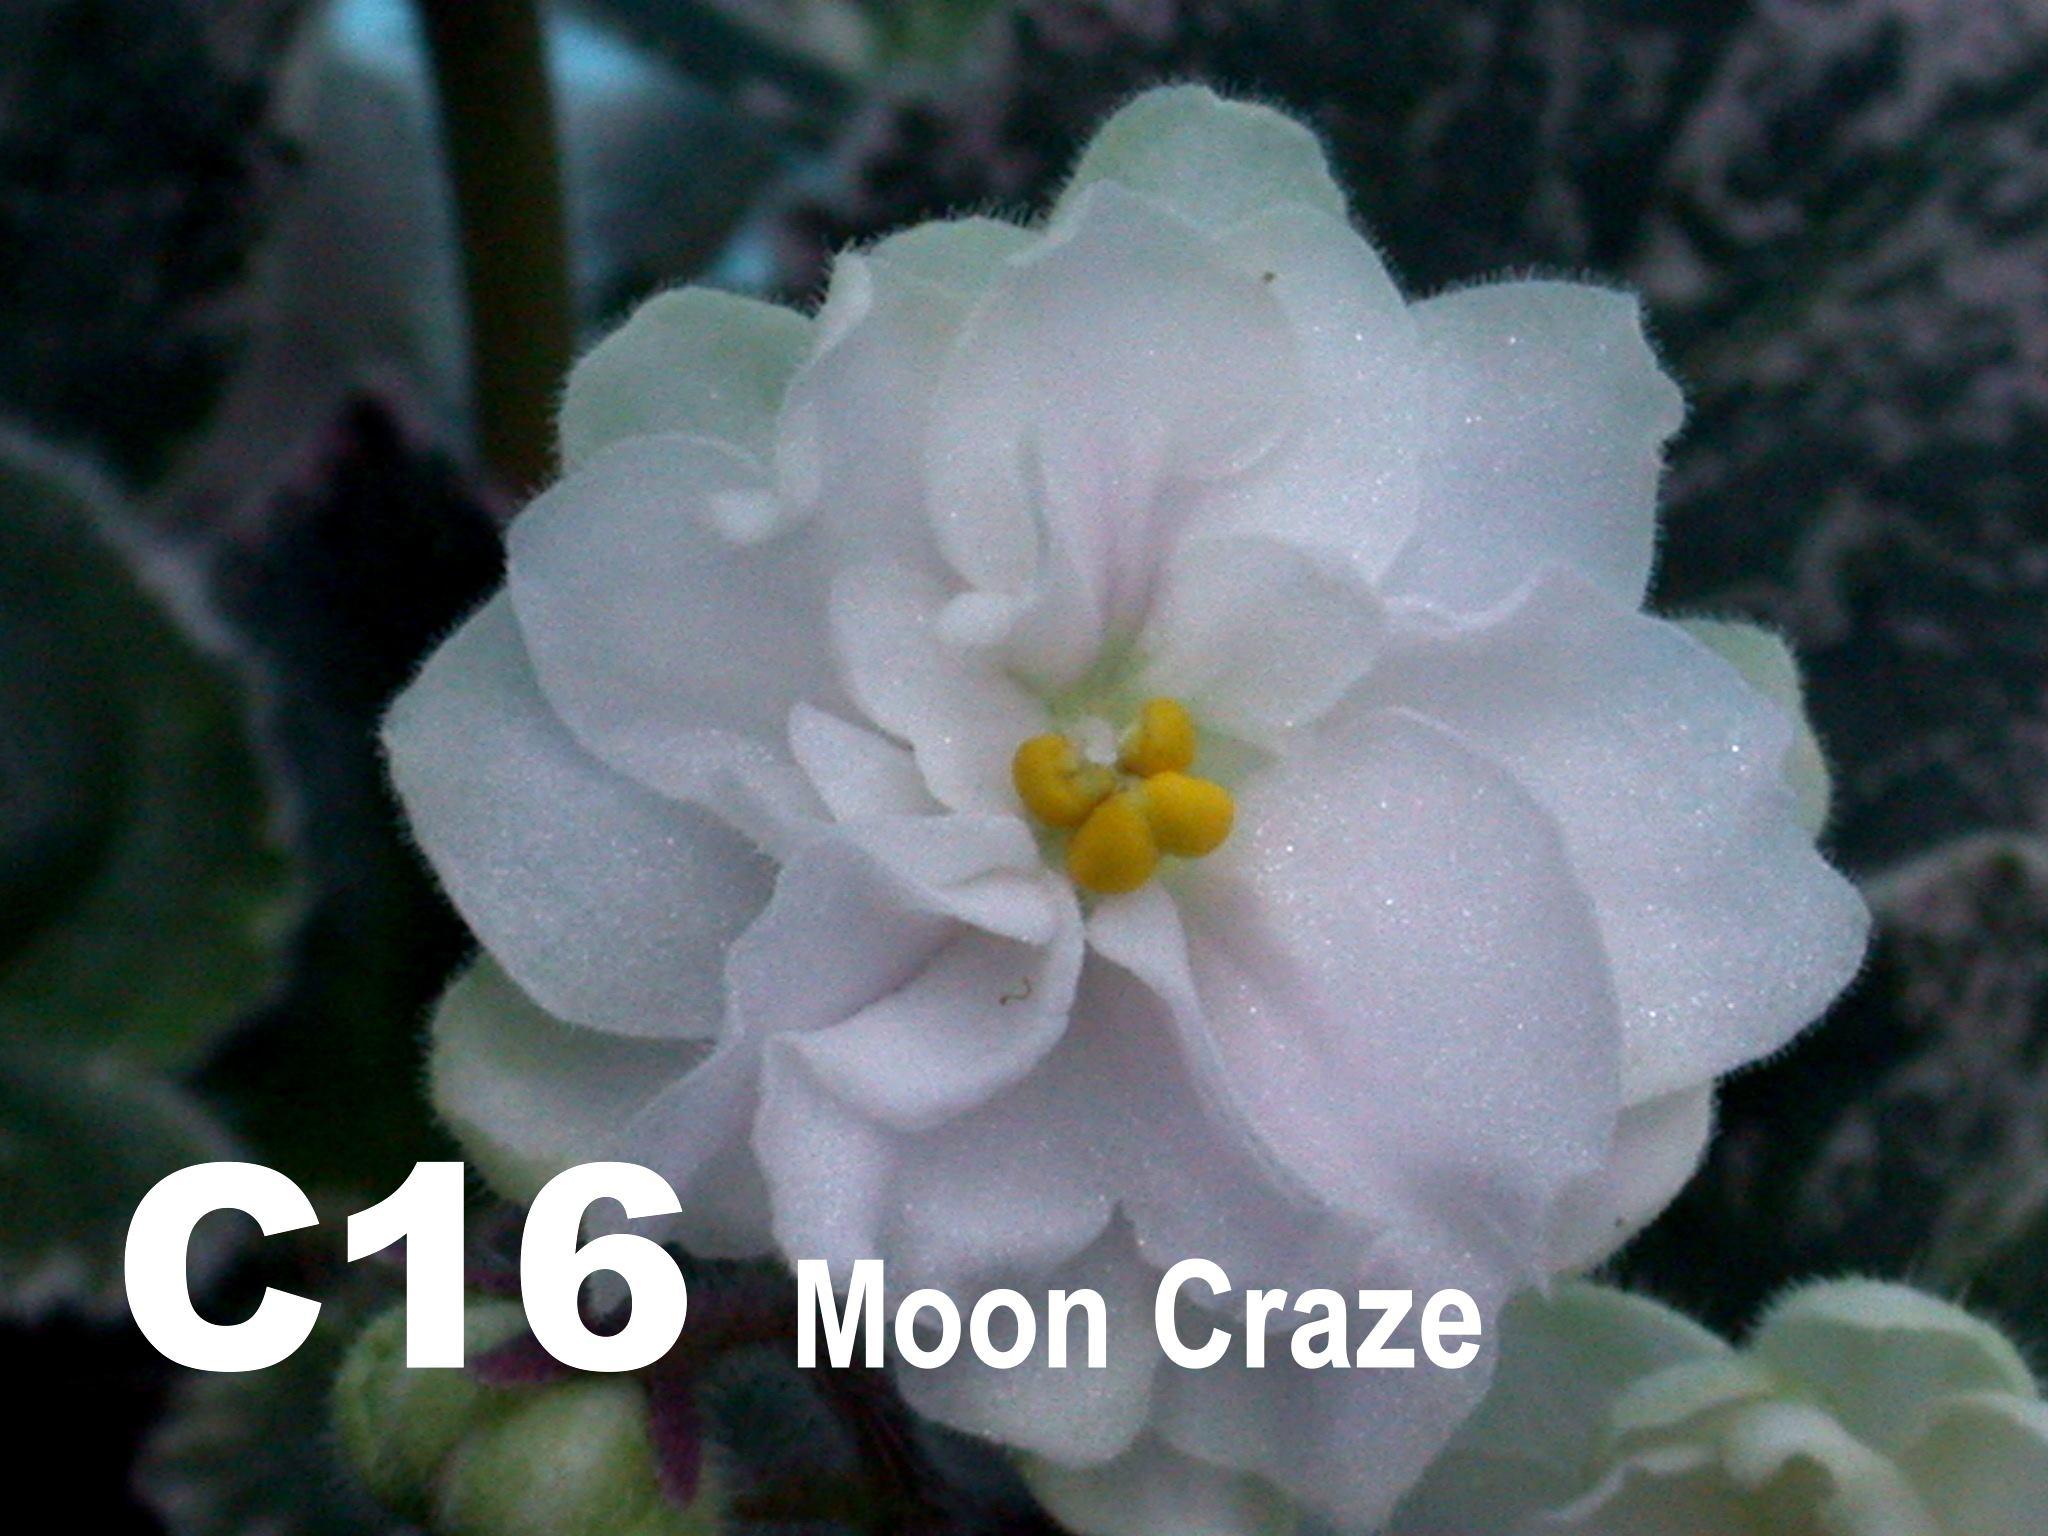 [C16] Moon Craze C16